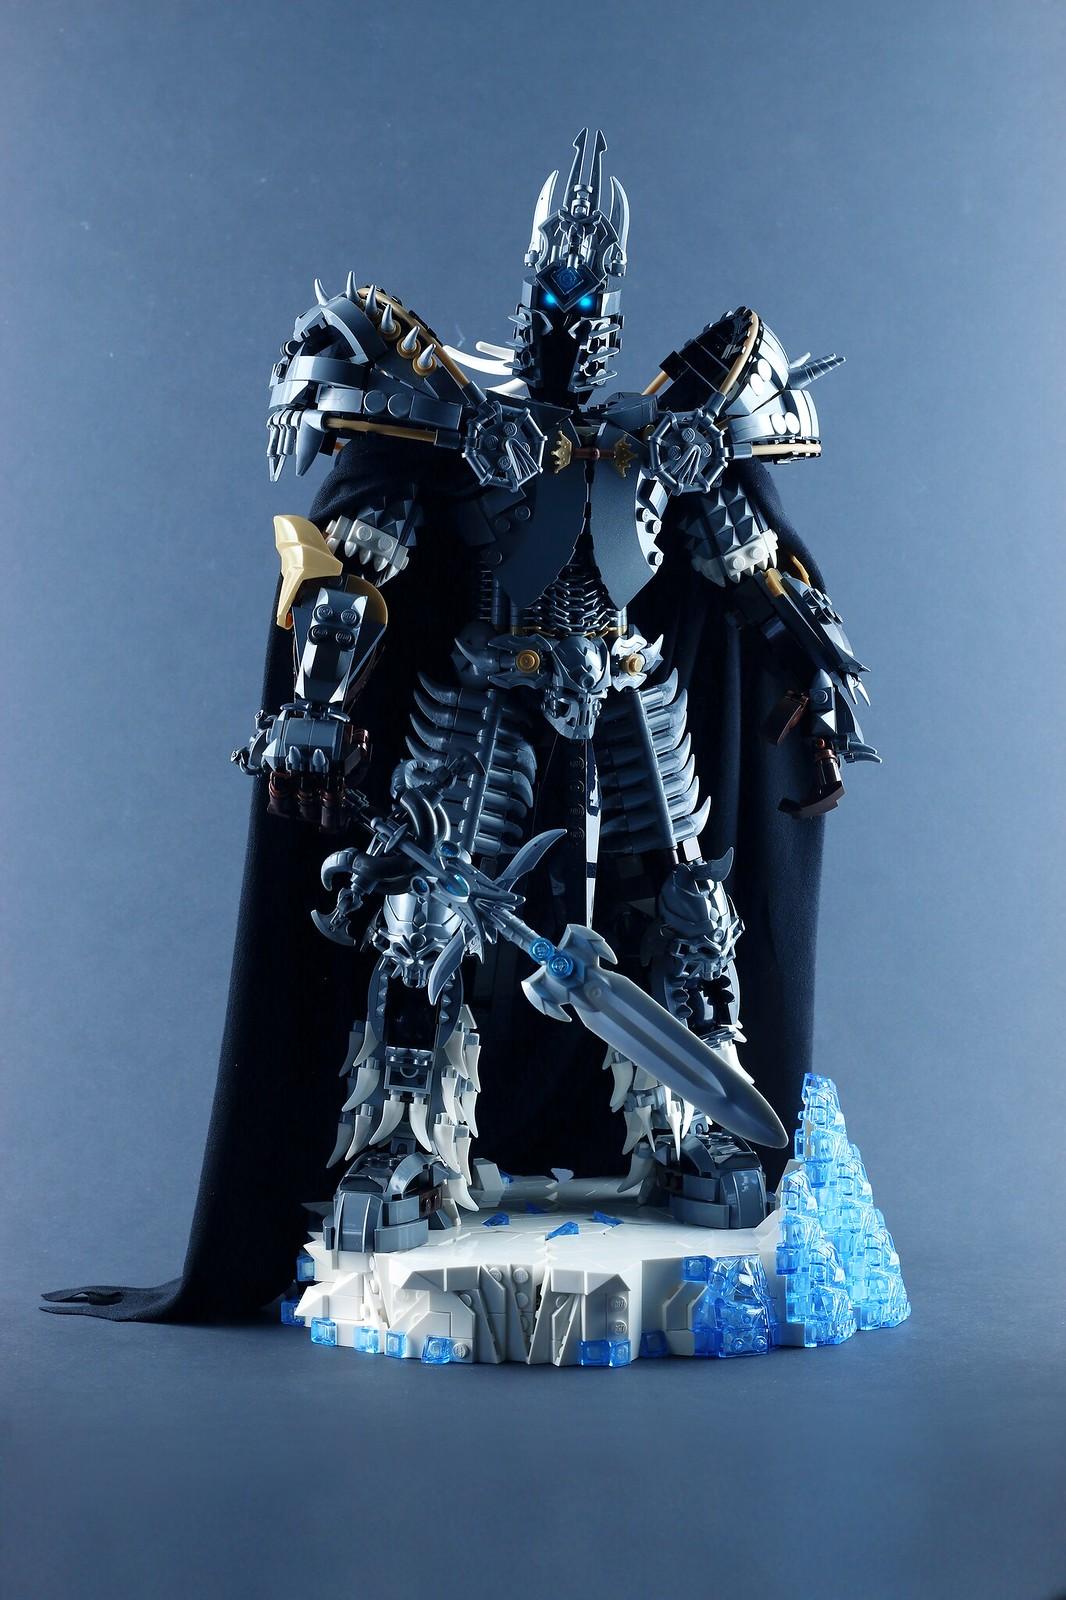 Lich King Arthas ????????????